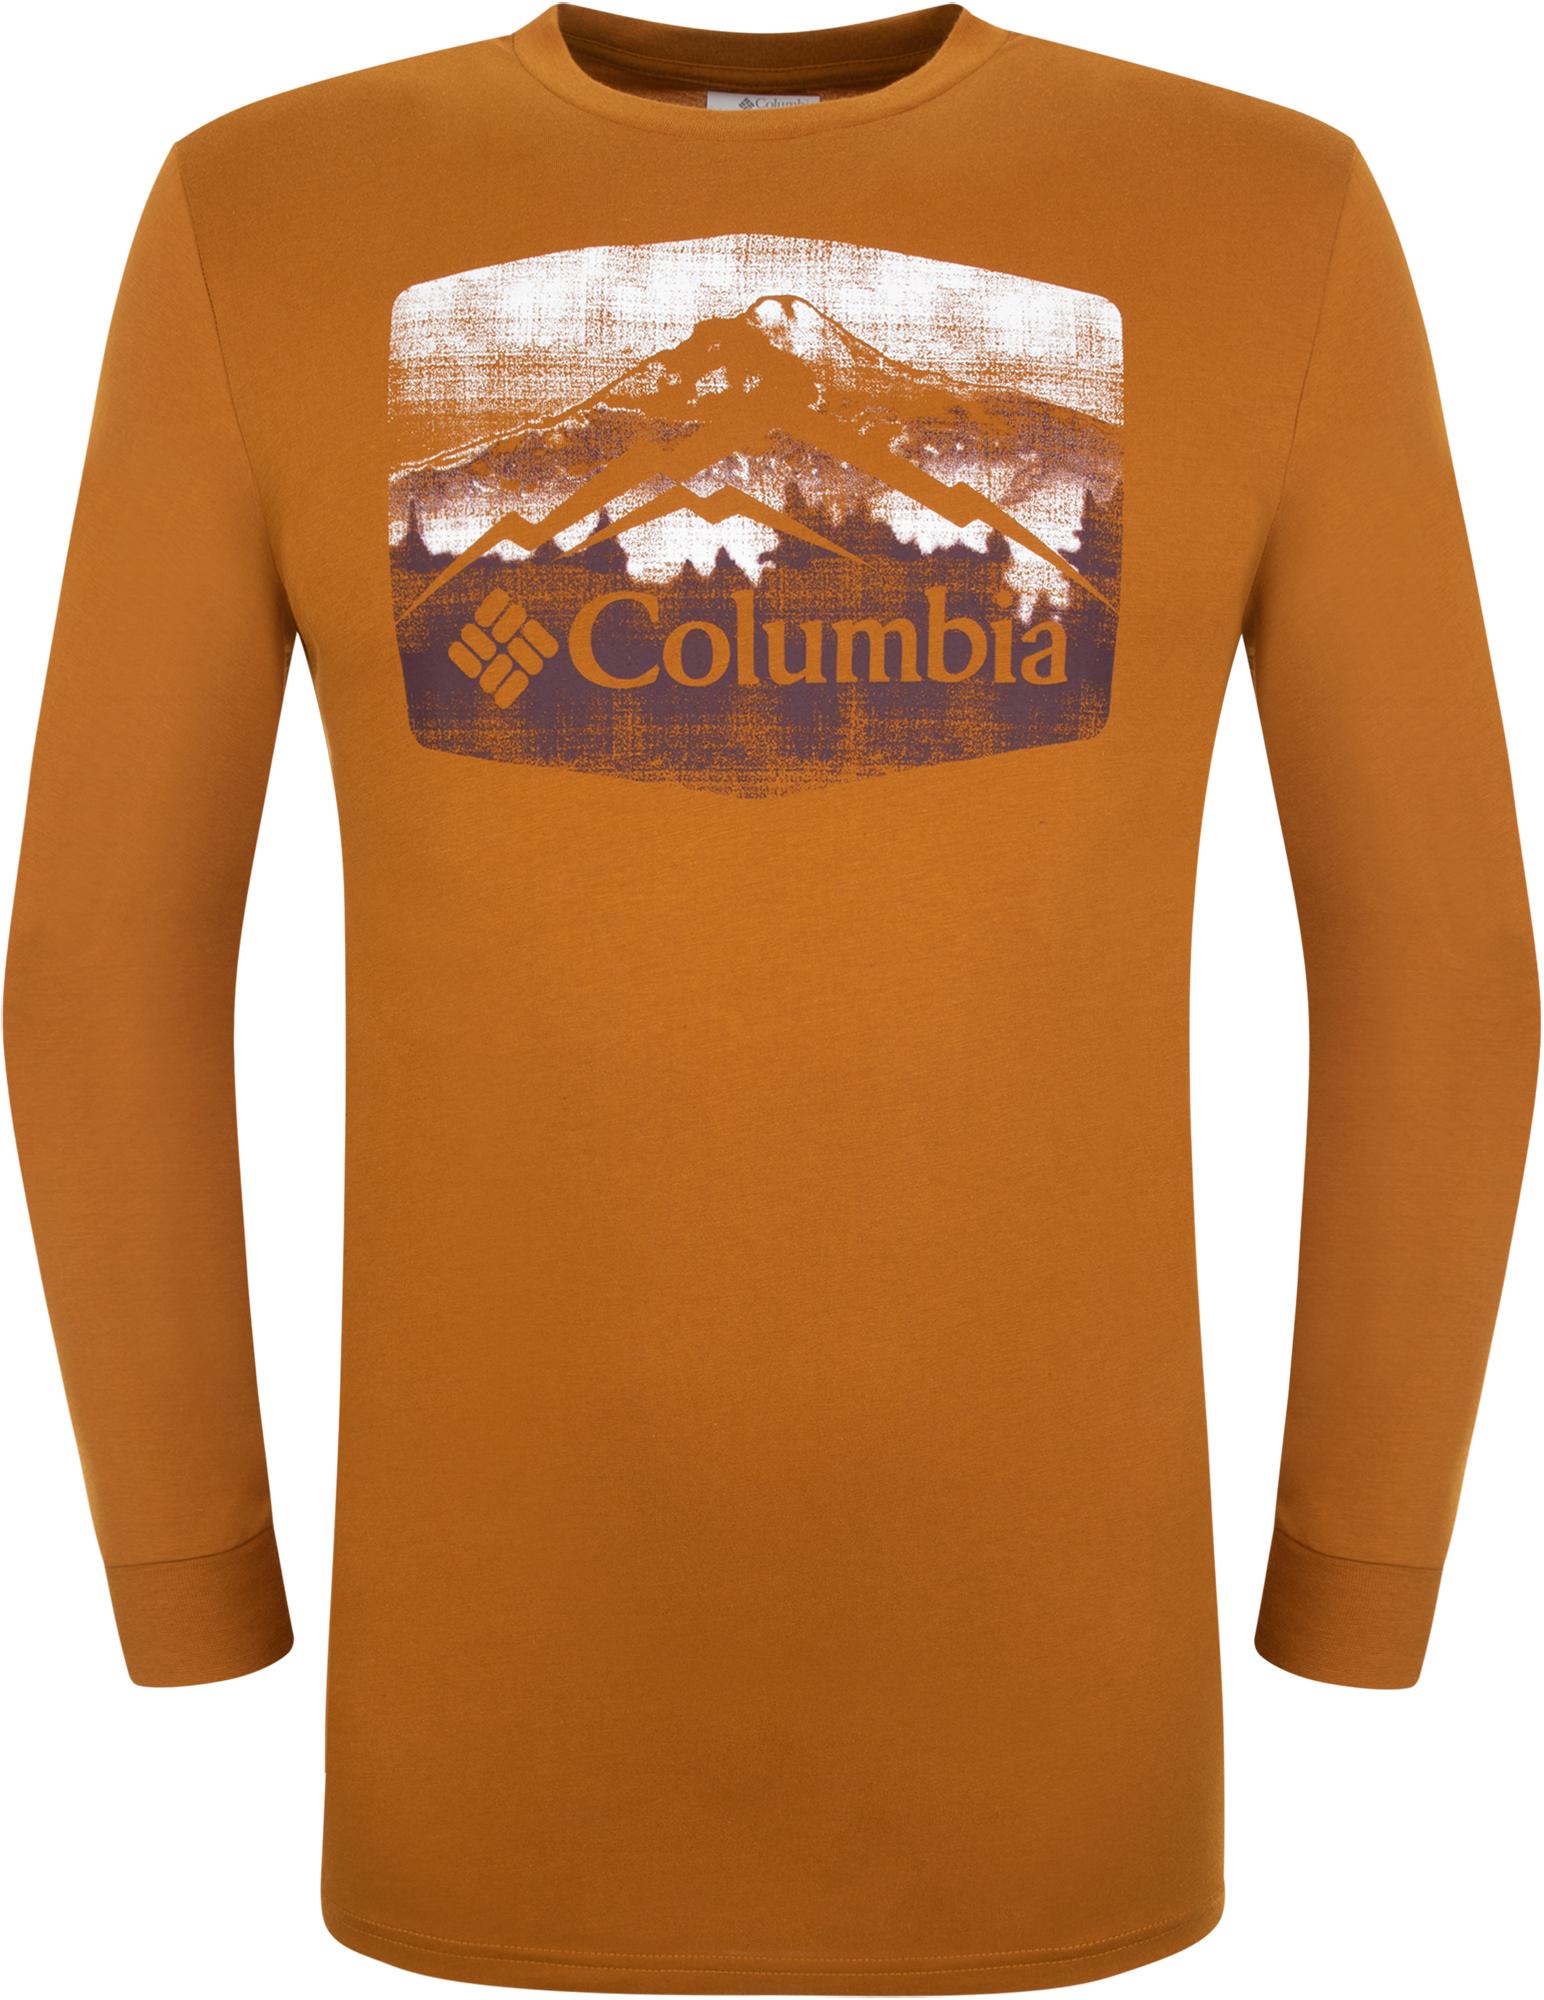 Columbia Футболка с длинным рукавом мужская Ranger River, размер 56-58